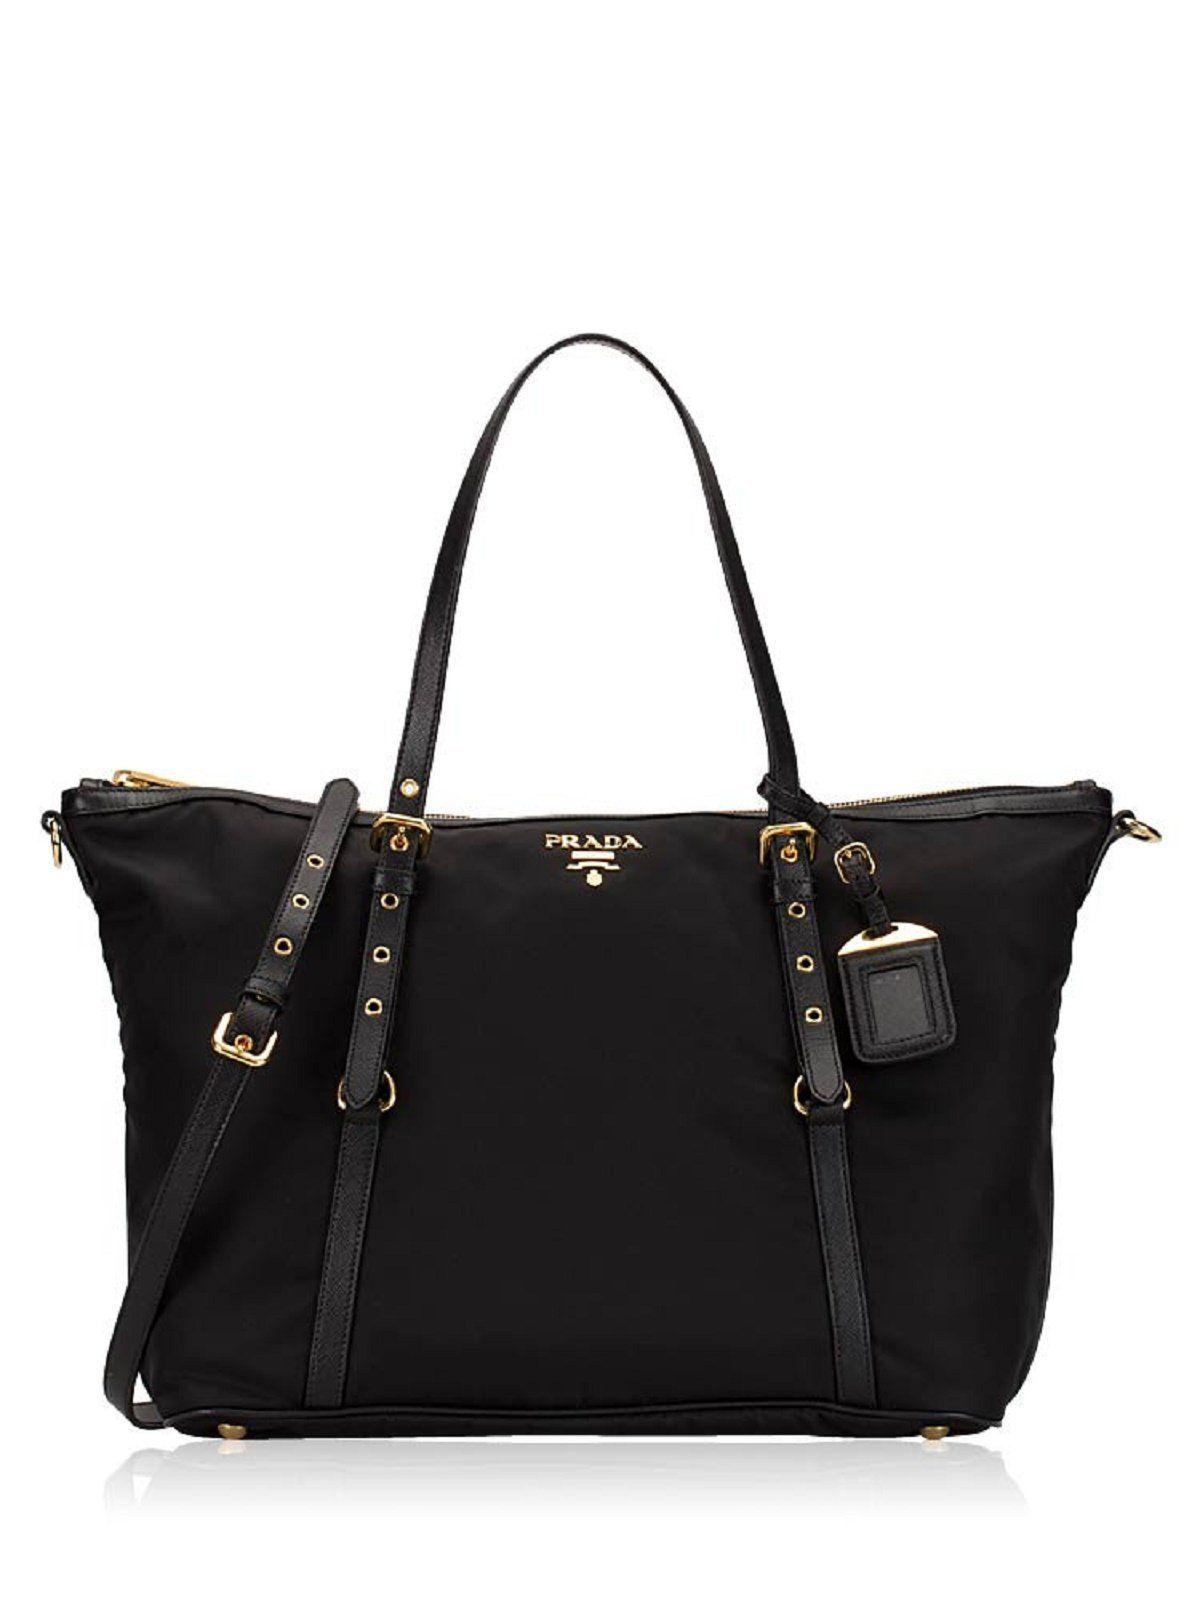 d1f041c74154d7 Prada Tessuto Black Nylon Leather Gold Hardware Shopping Tote Bag 1BG253